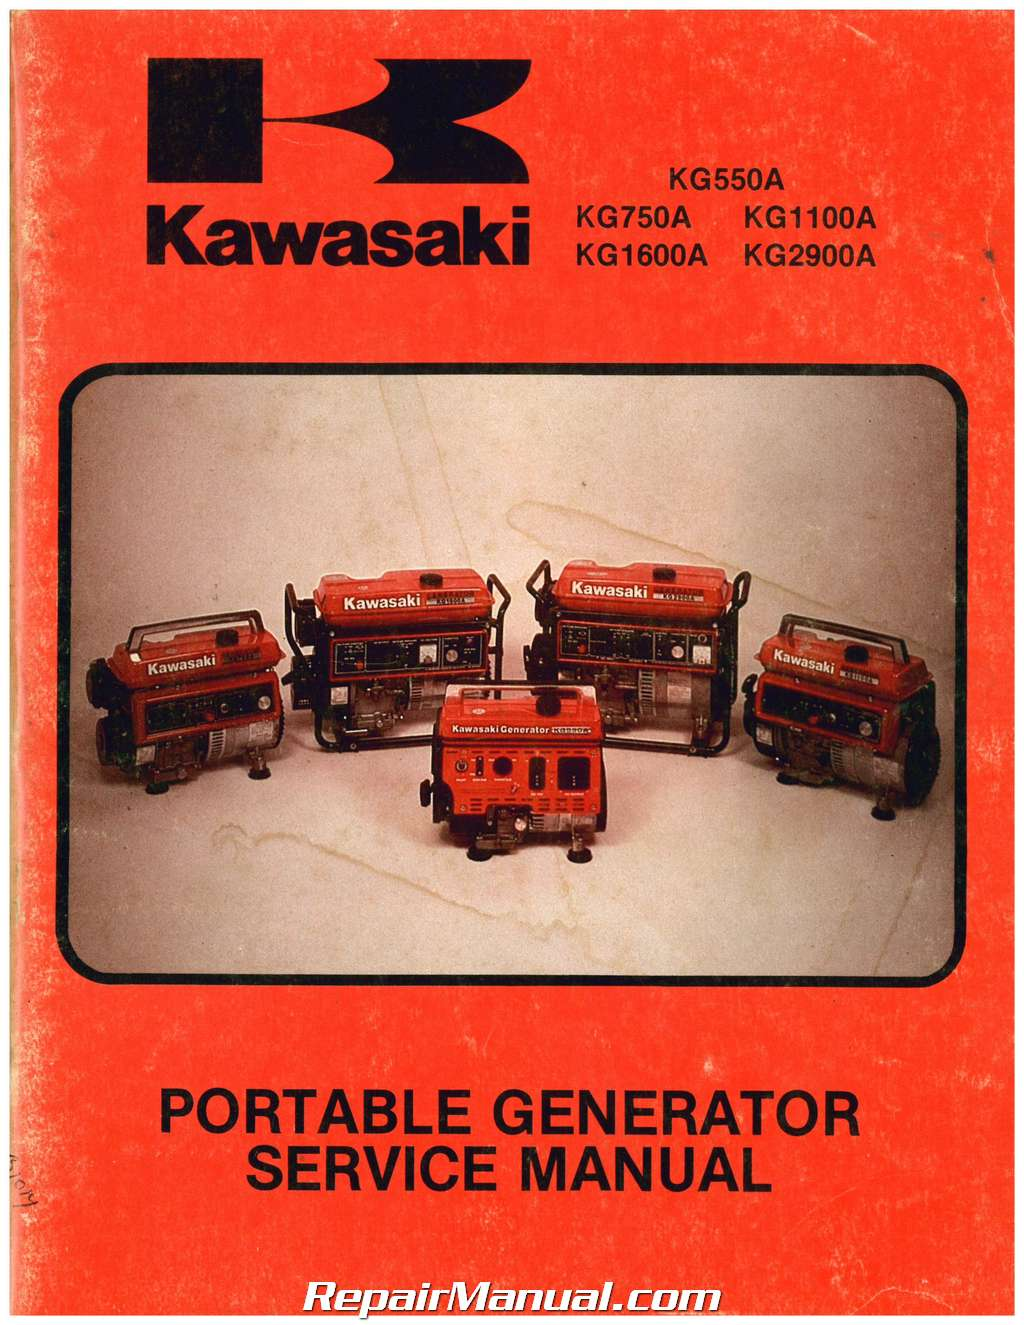 Kawasaki Kg550a Kg750a Kg1100a Kg1600a Kg2900a Portable Generator Service Manual